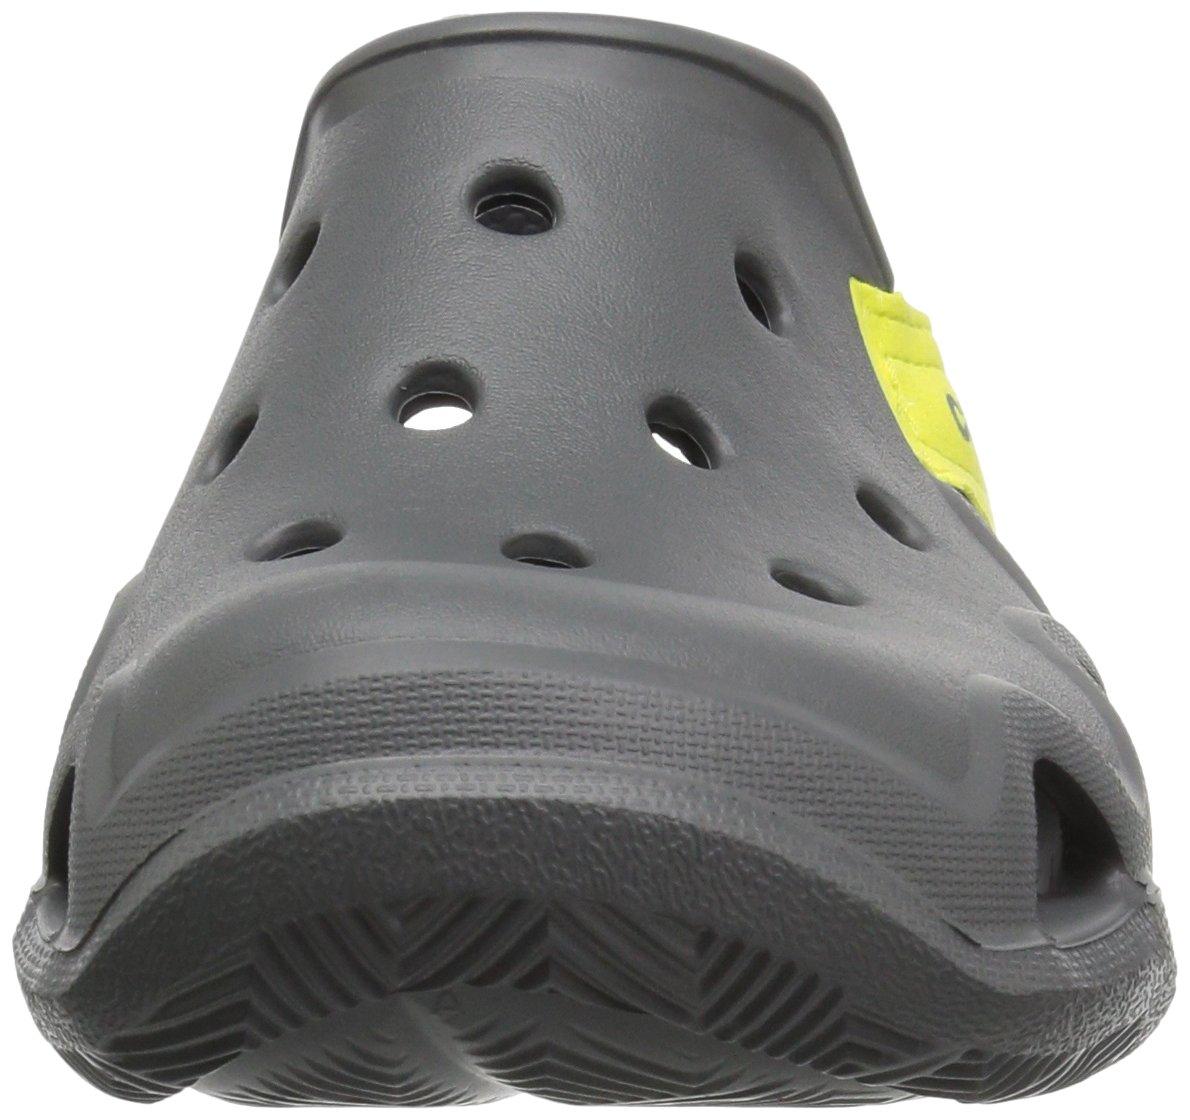 Crocs Unisex-Kids Swiftwater Wave Flat Sandal, Slate Grey/Tennis Ball Green, 13 M US Little Kid by Crocs (Image #4)